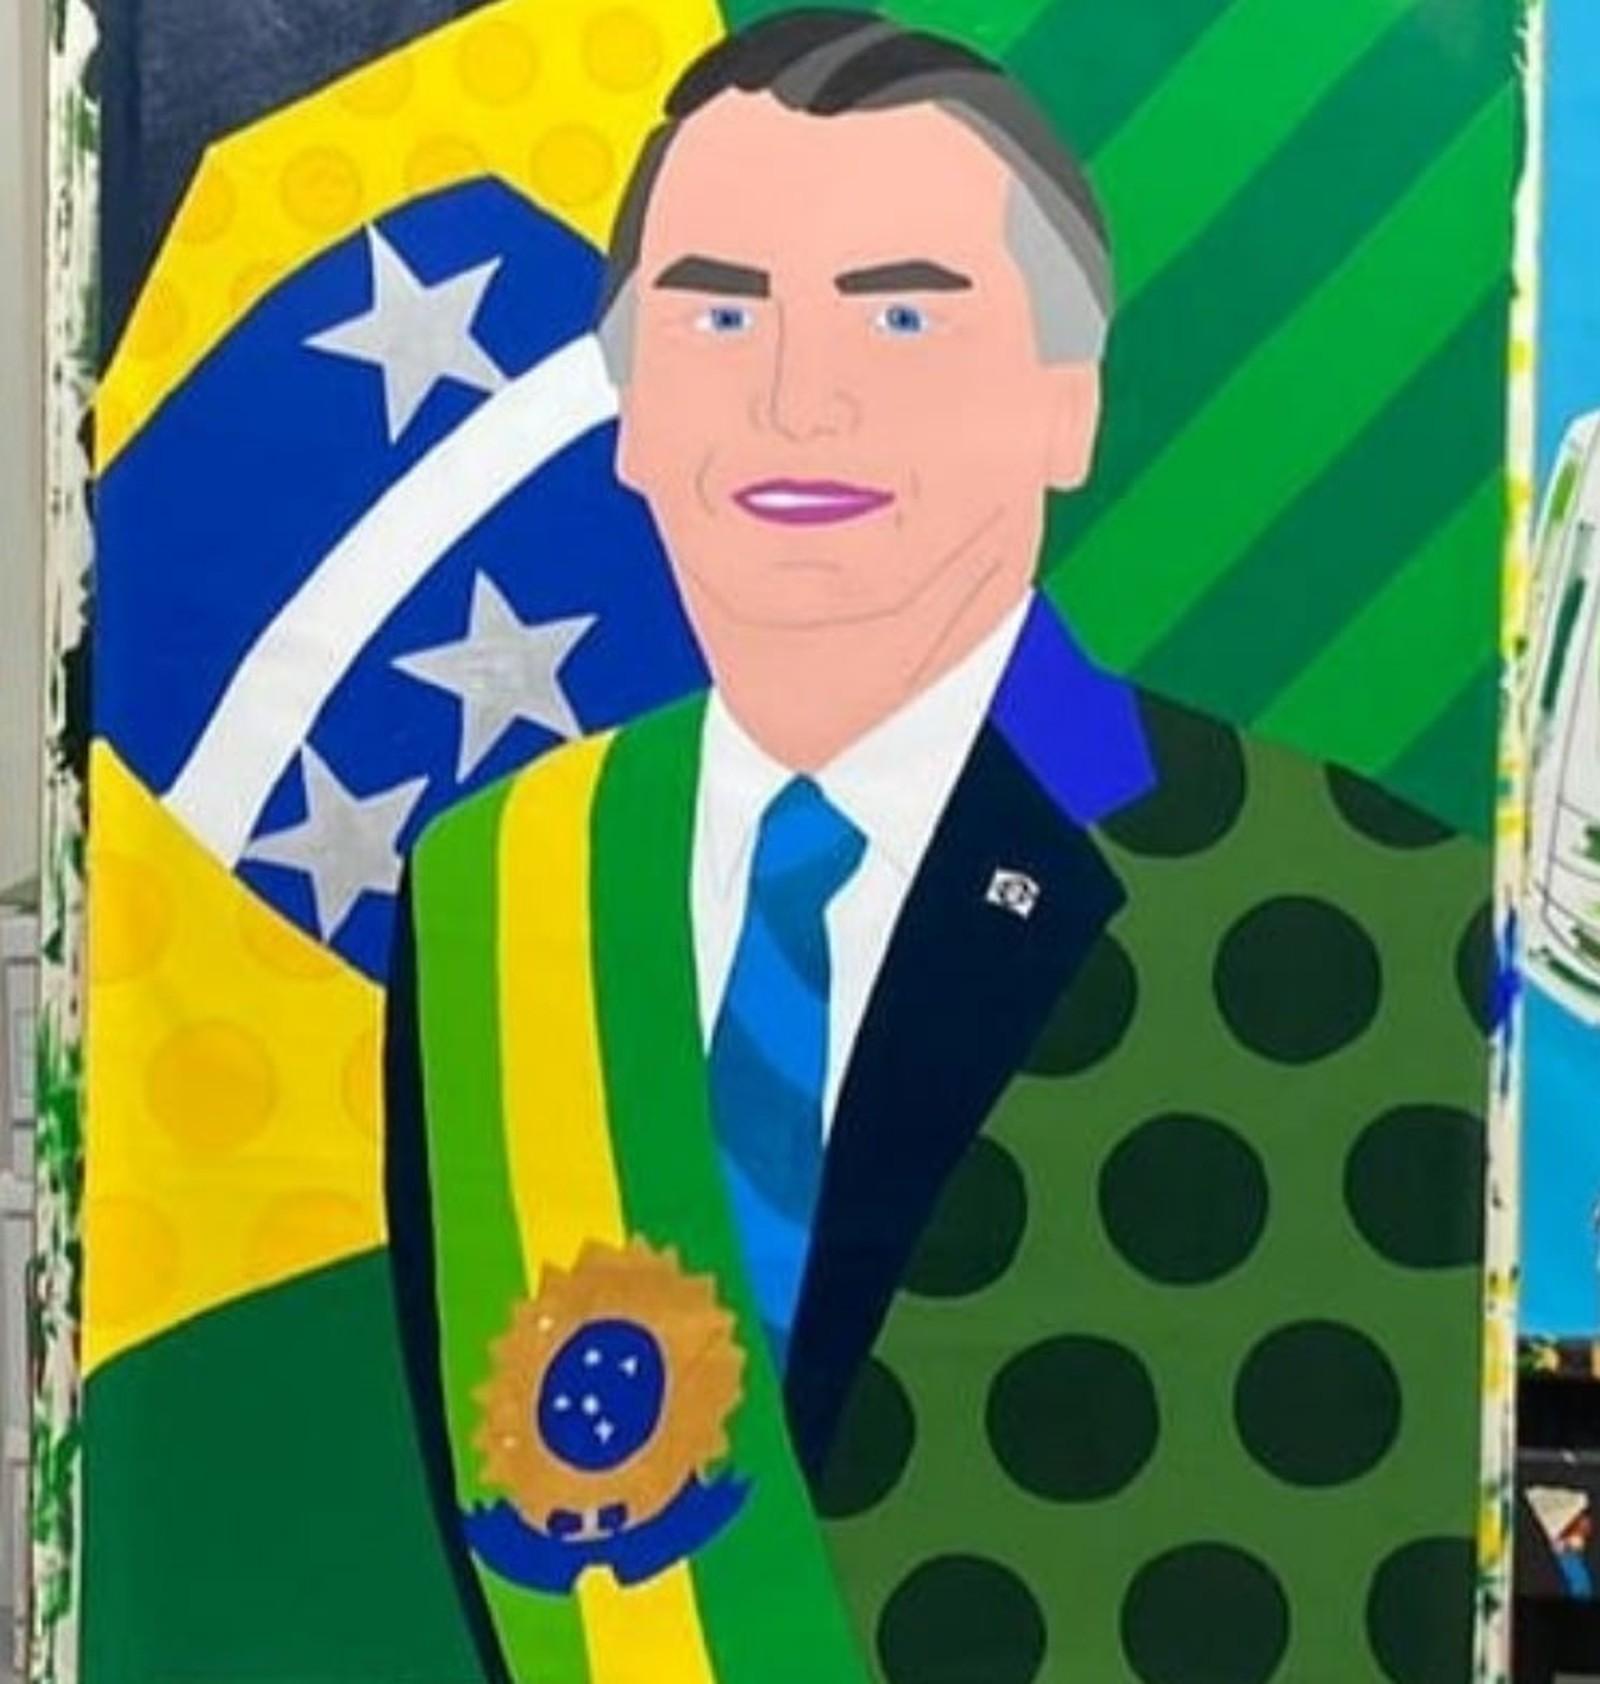 Pintura de Romero Britto retrata o Presidente Jair Bolsonaro e foi divulgada por Flávio Bolsonaro — Foto: Reprodução/Instagram/flaviobolsonaro